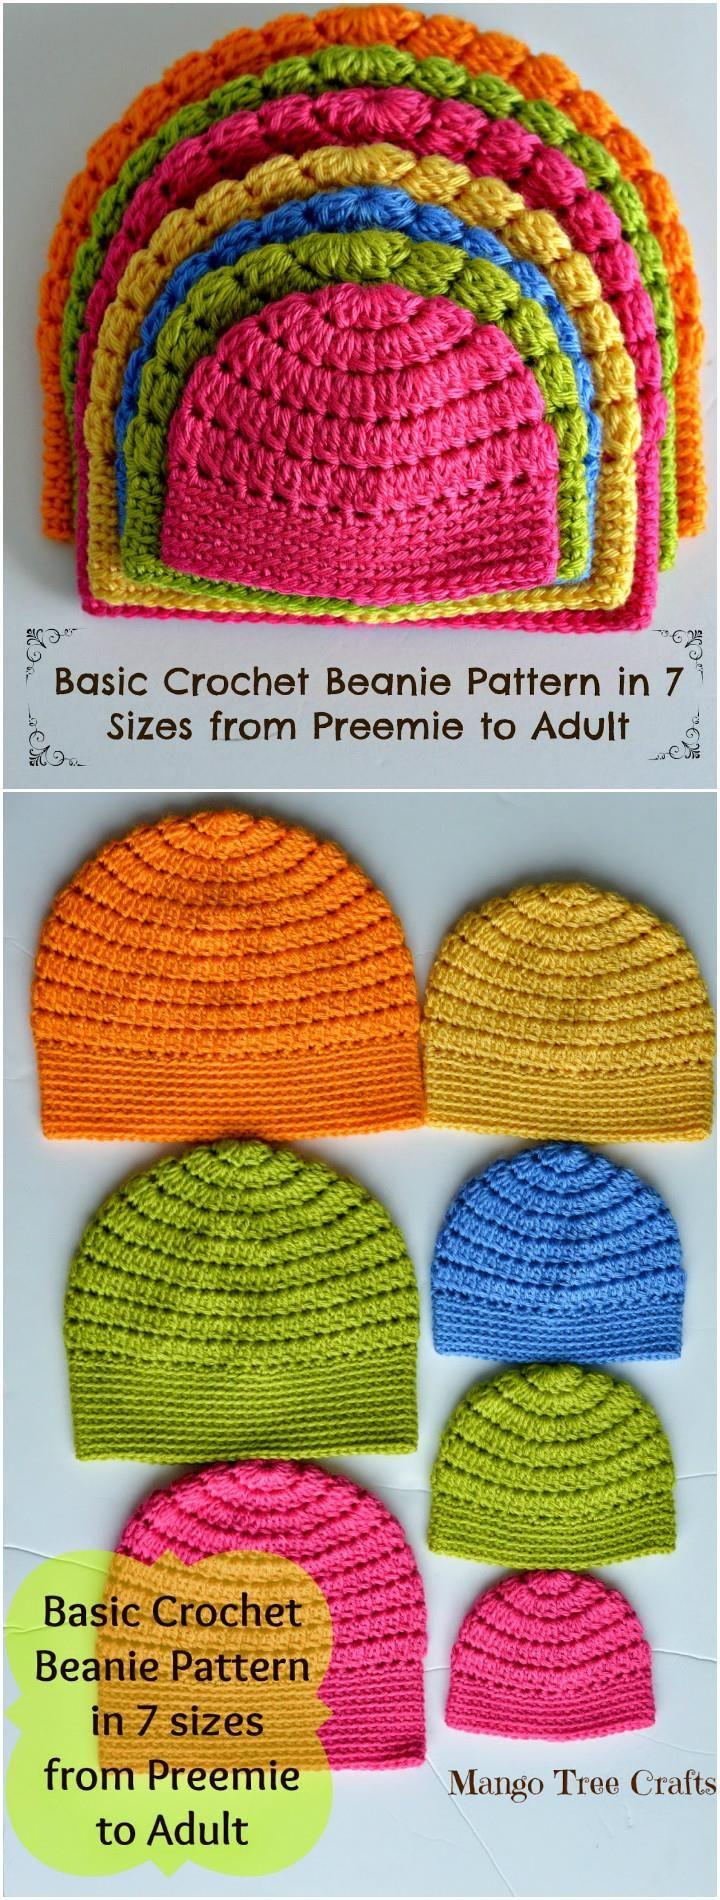 17 Free Crochet Baby Beanie Hat Patterns Hats Headbands Dinah Daisy Dish Cloth Mango Tree Crafts Sizes 101